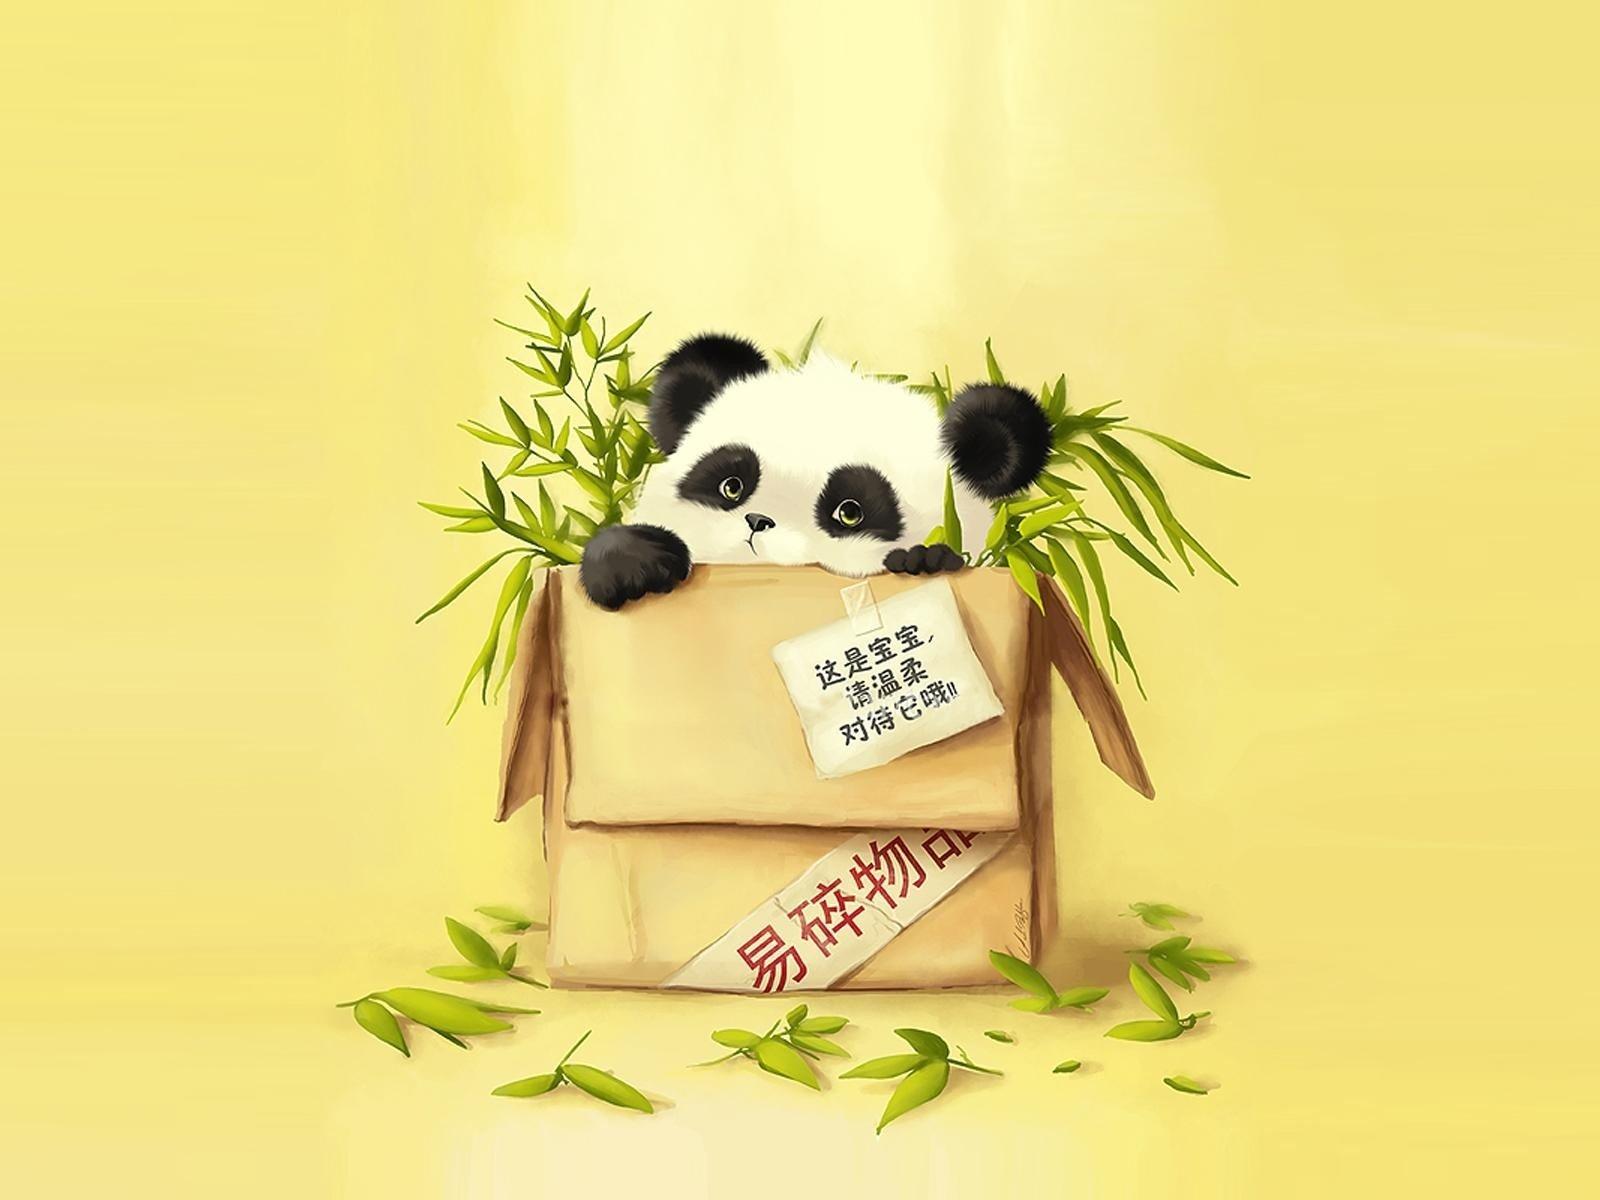 Panda Fond d'écran and Arrière-Plan | 1600x1200 | ID:361491 - Wallpaper Abyss